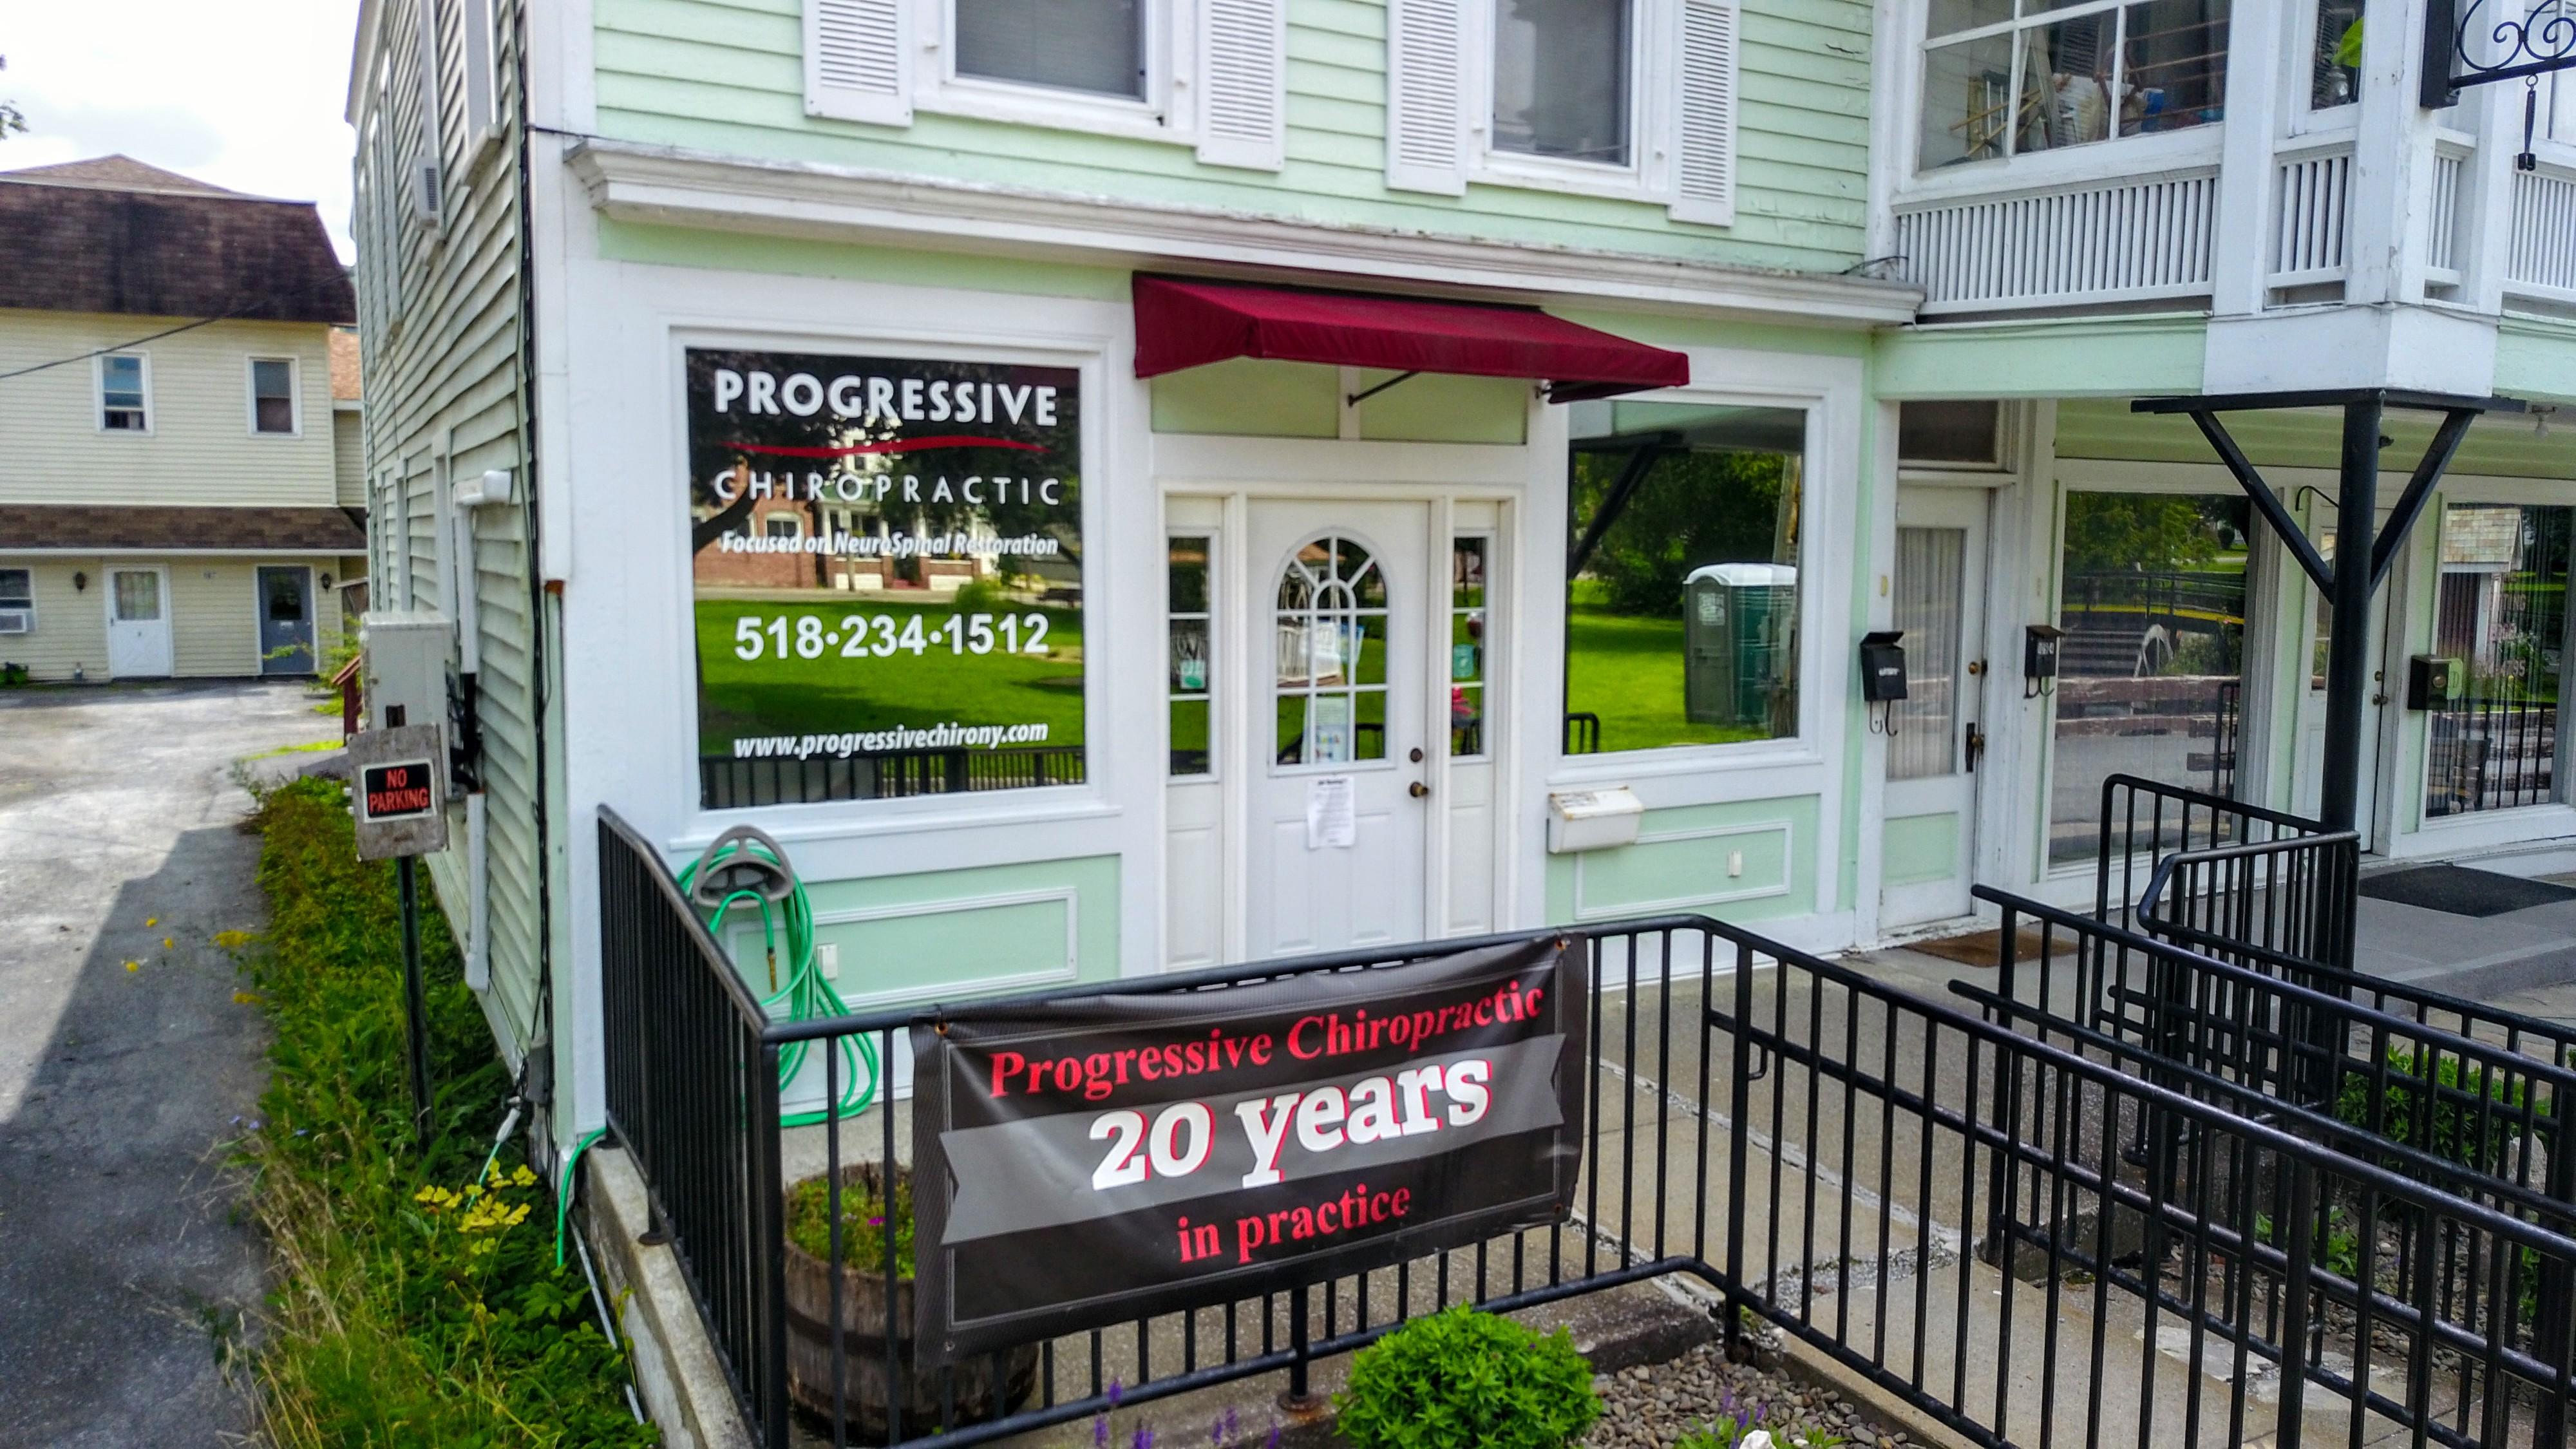 Progressive Chiropractic storefront in Cobleskill